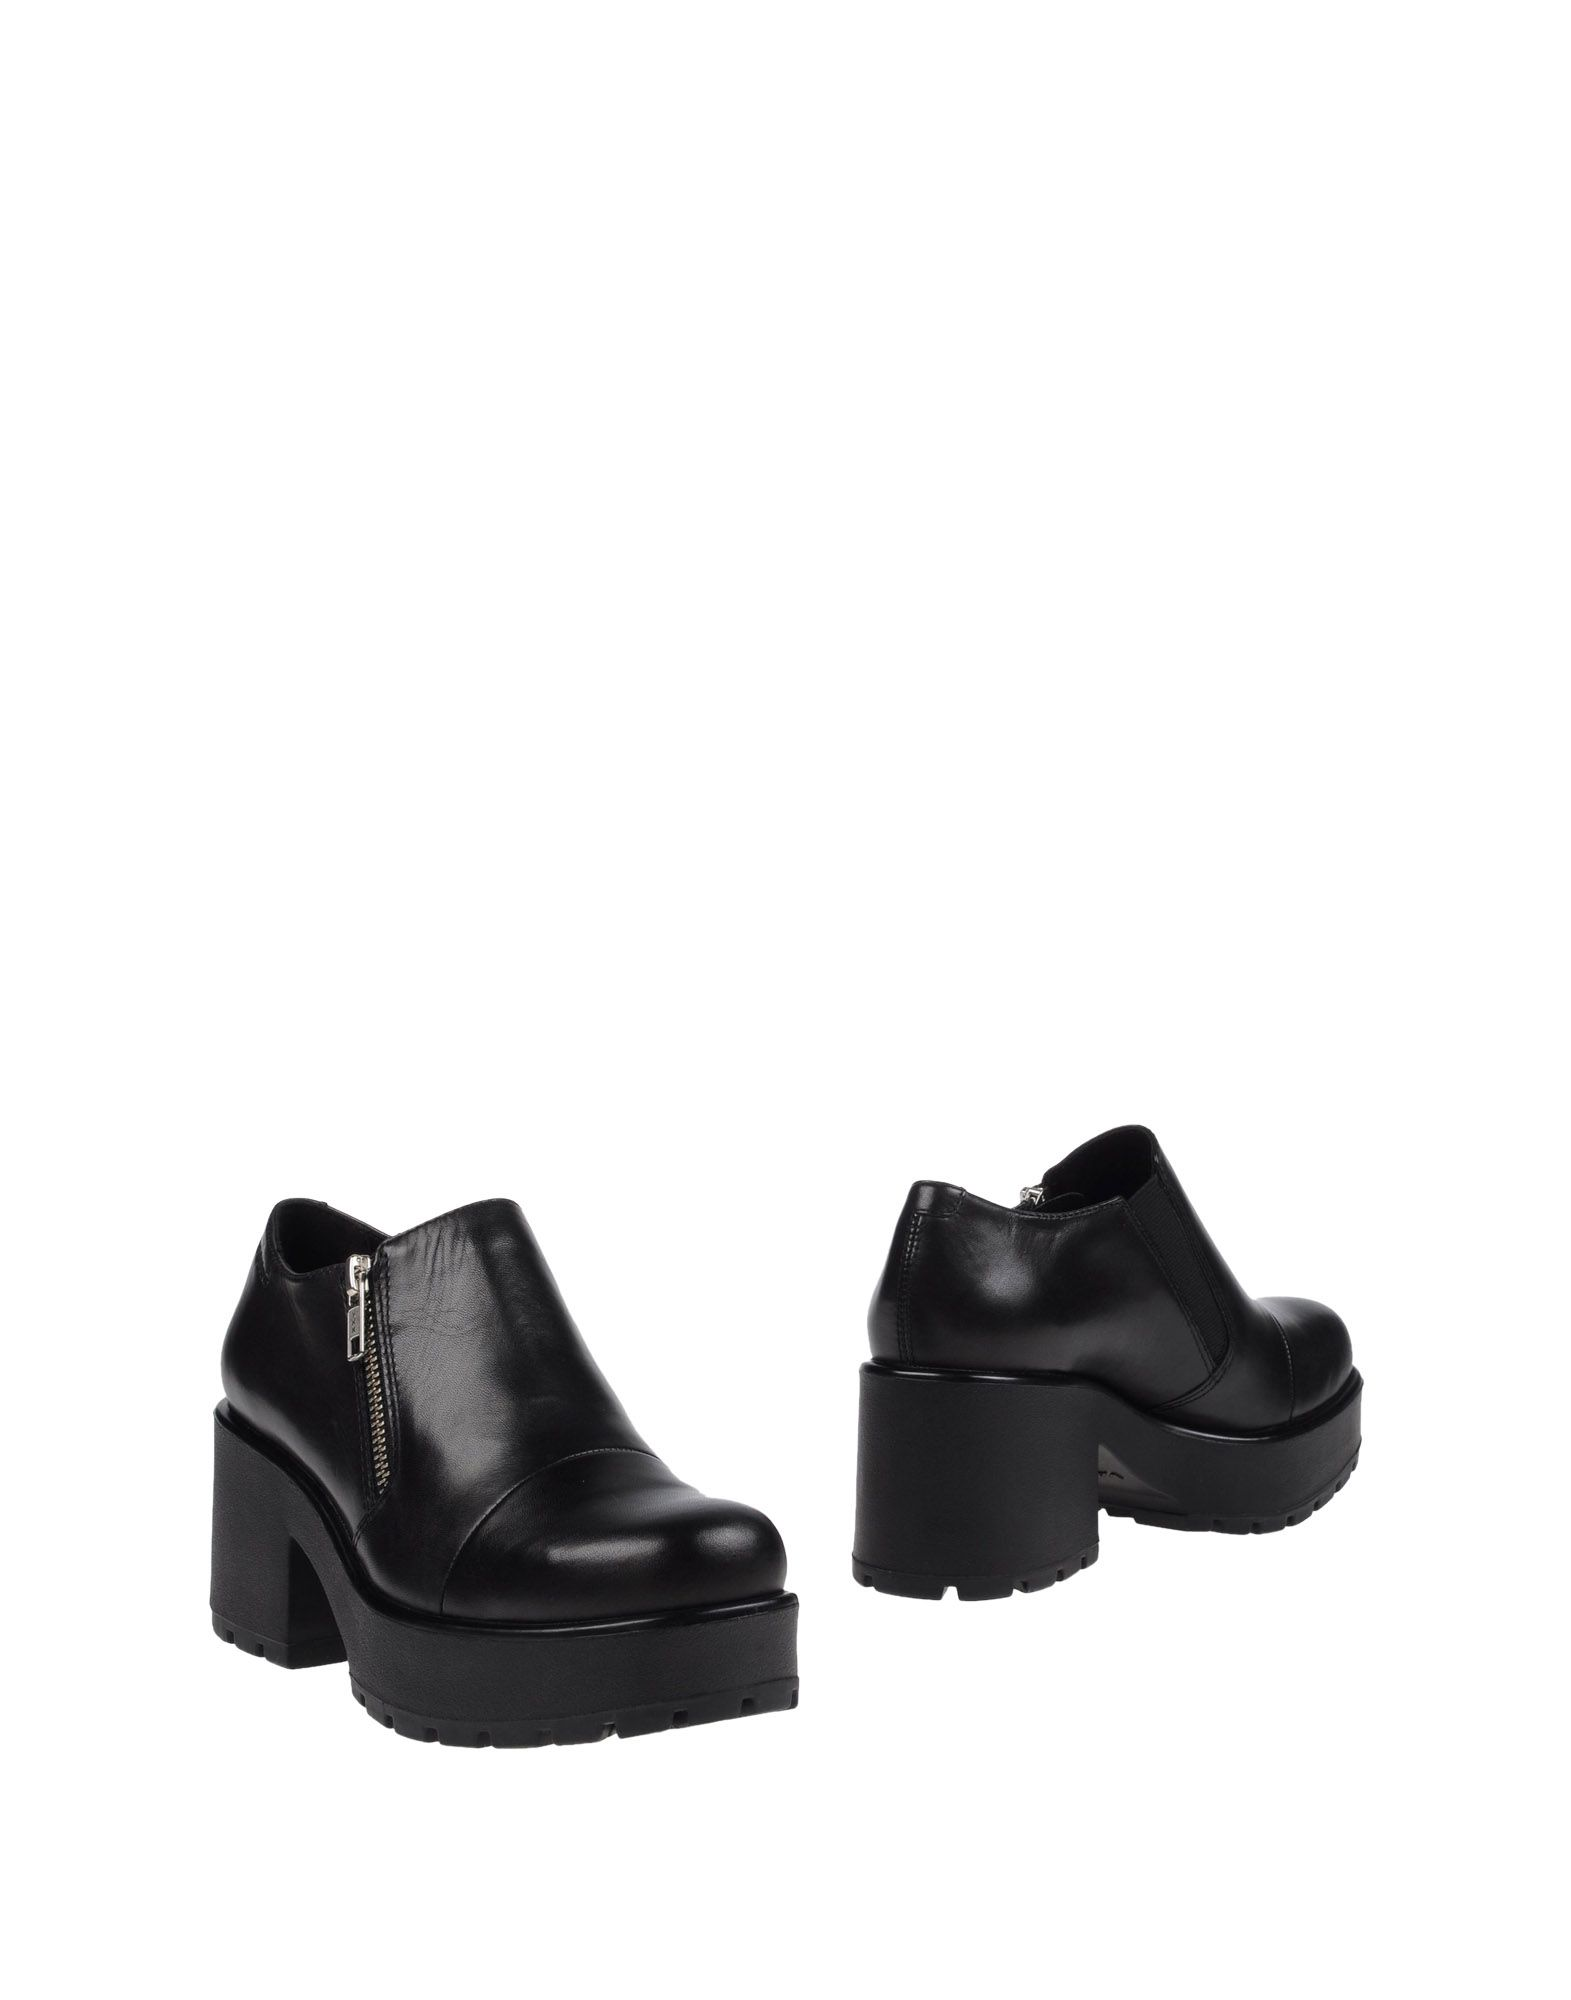 Bottine Vagabond Shoemakers Femme - Bottines Vagabond Shoemakers sur